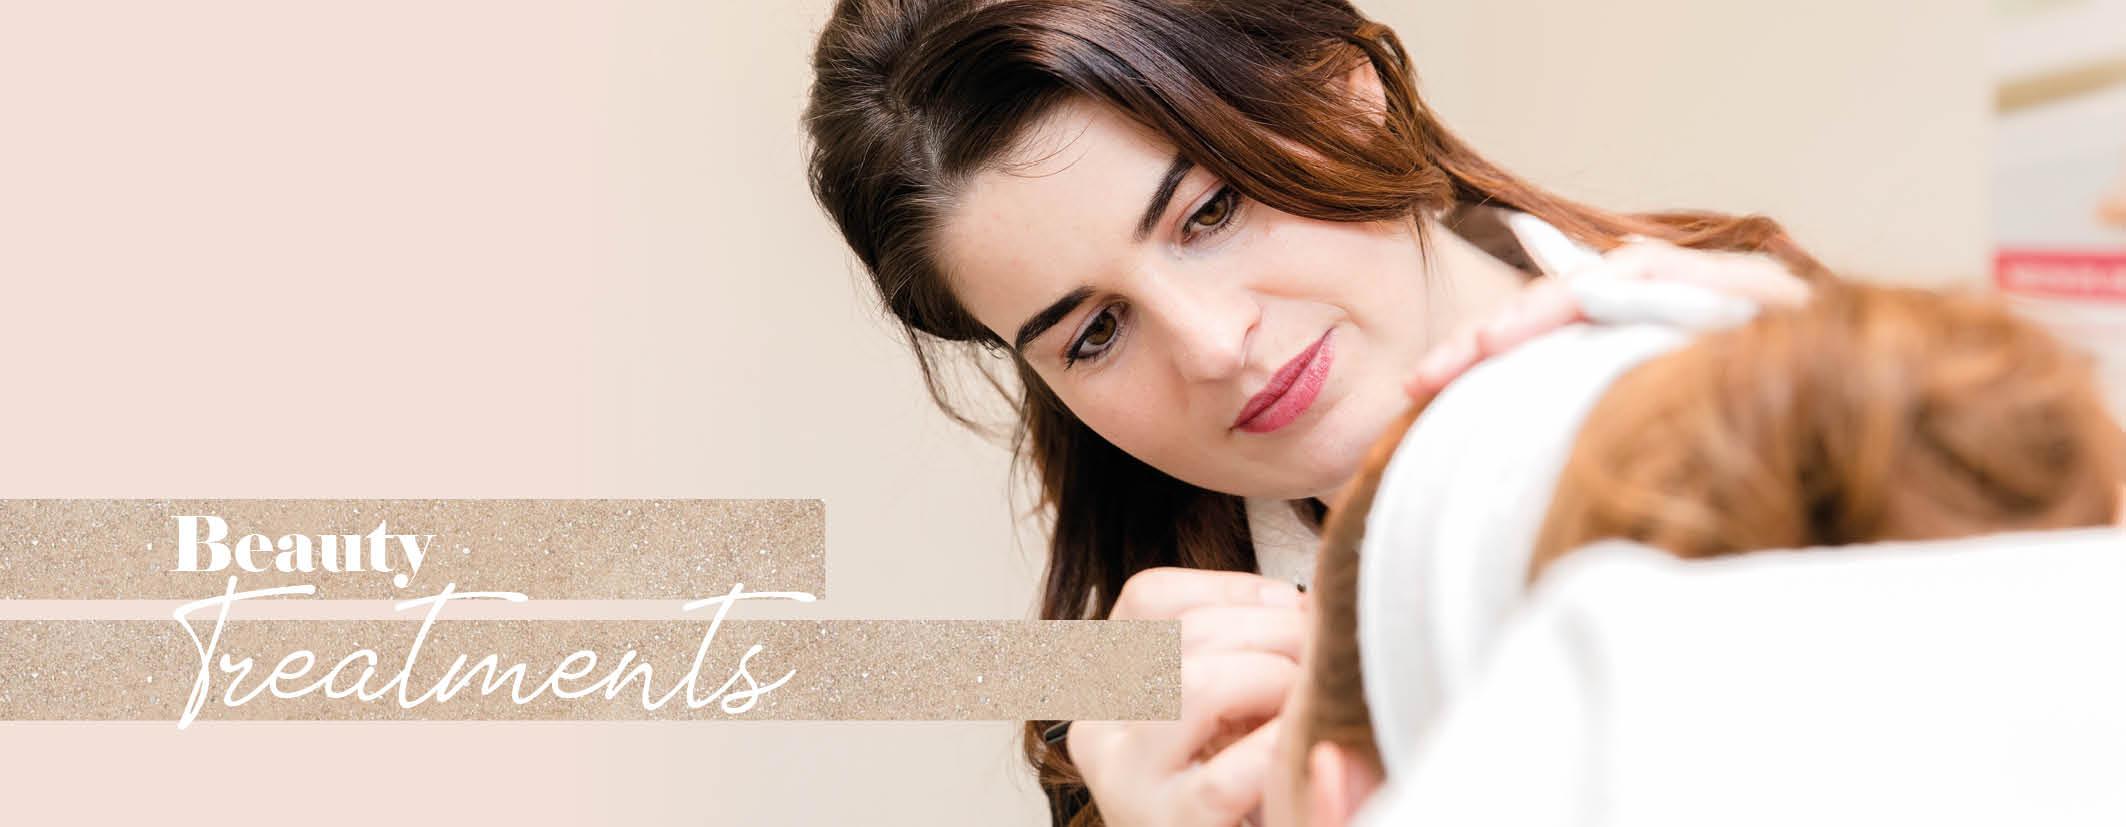 Schoonheidsbehandelingen Echt - Jennifer Penners - Skinics